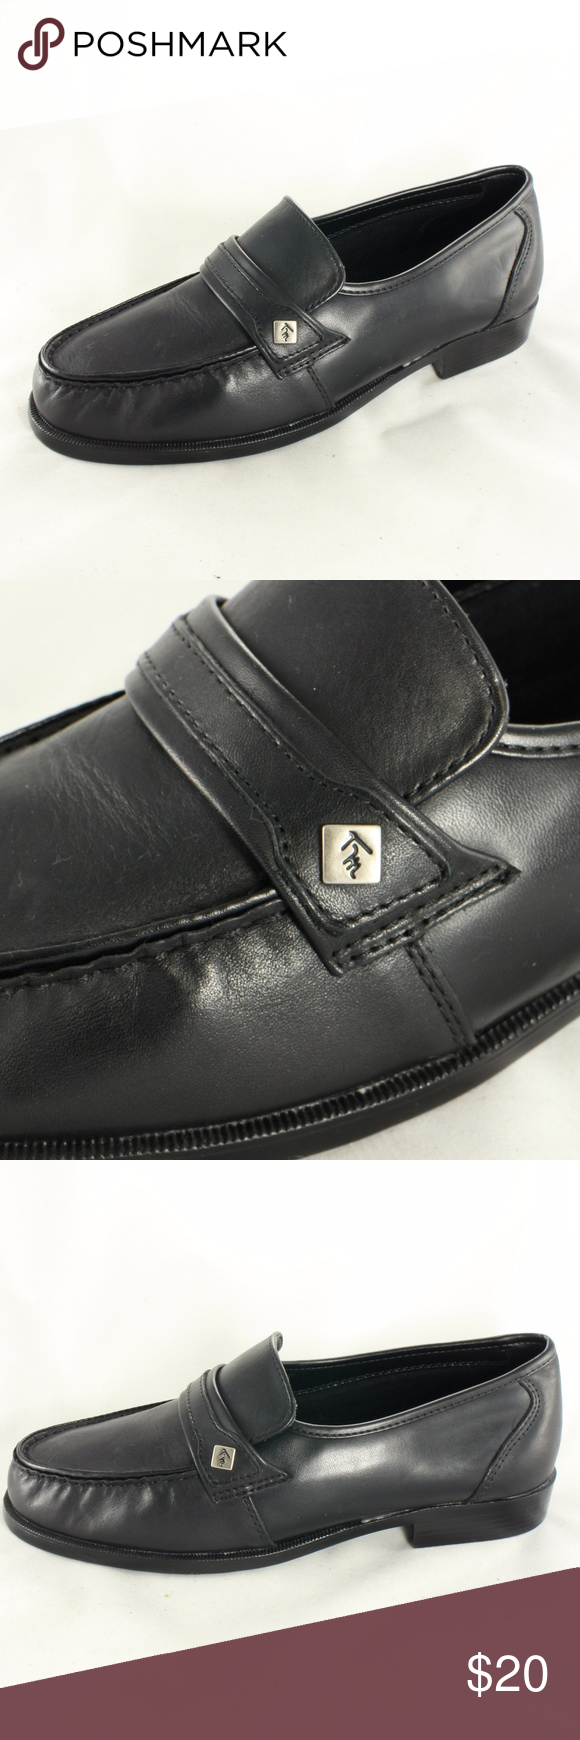 New Thom Mcan Men S Karl Black Dress Loafer 9w Black Dress Loafers Dress Loafers Loafers [ 1740 x 580 Pixel ]